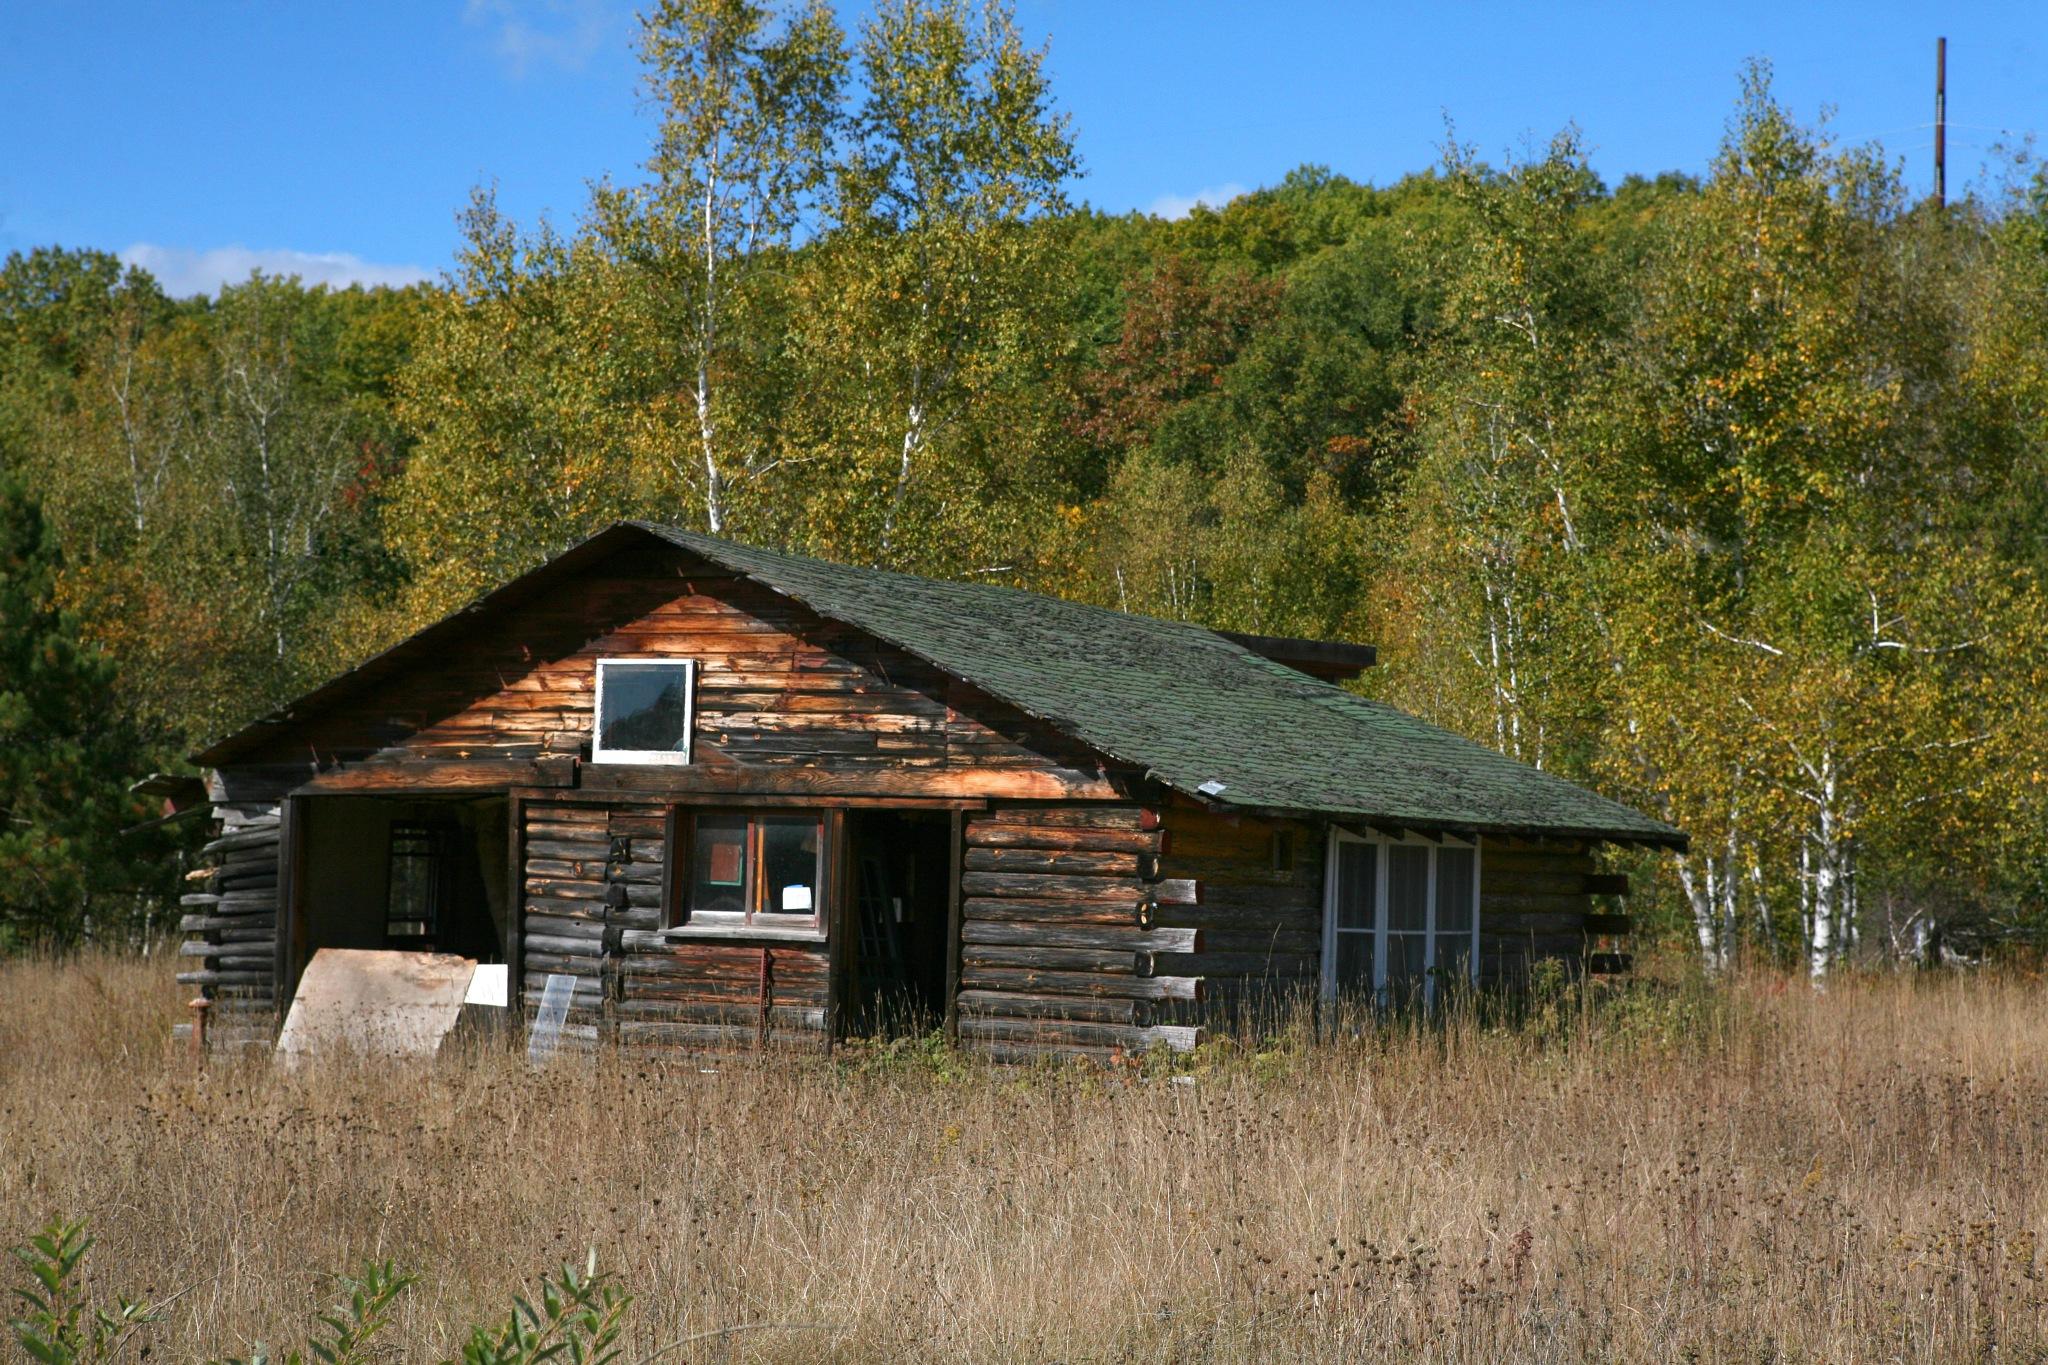 deserted cabin in the north woods by Bernard Mordorski